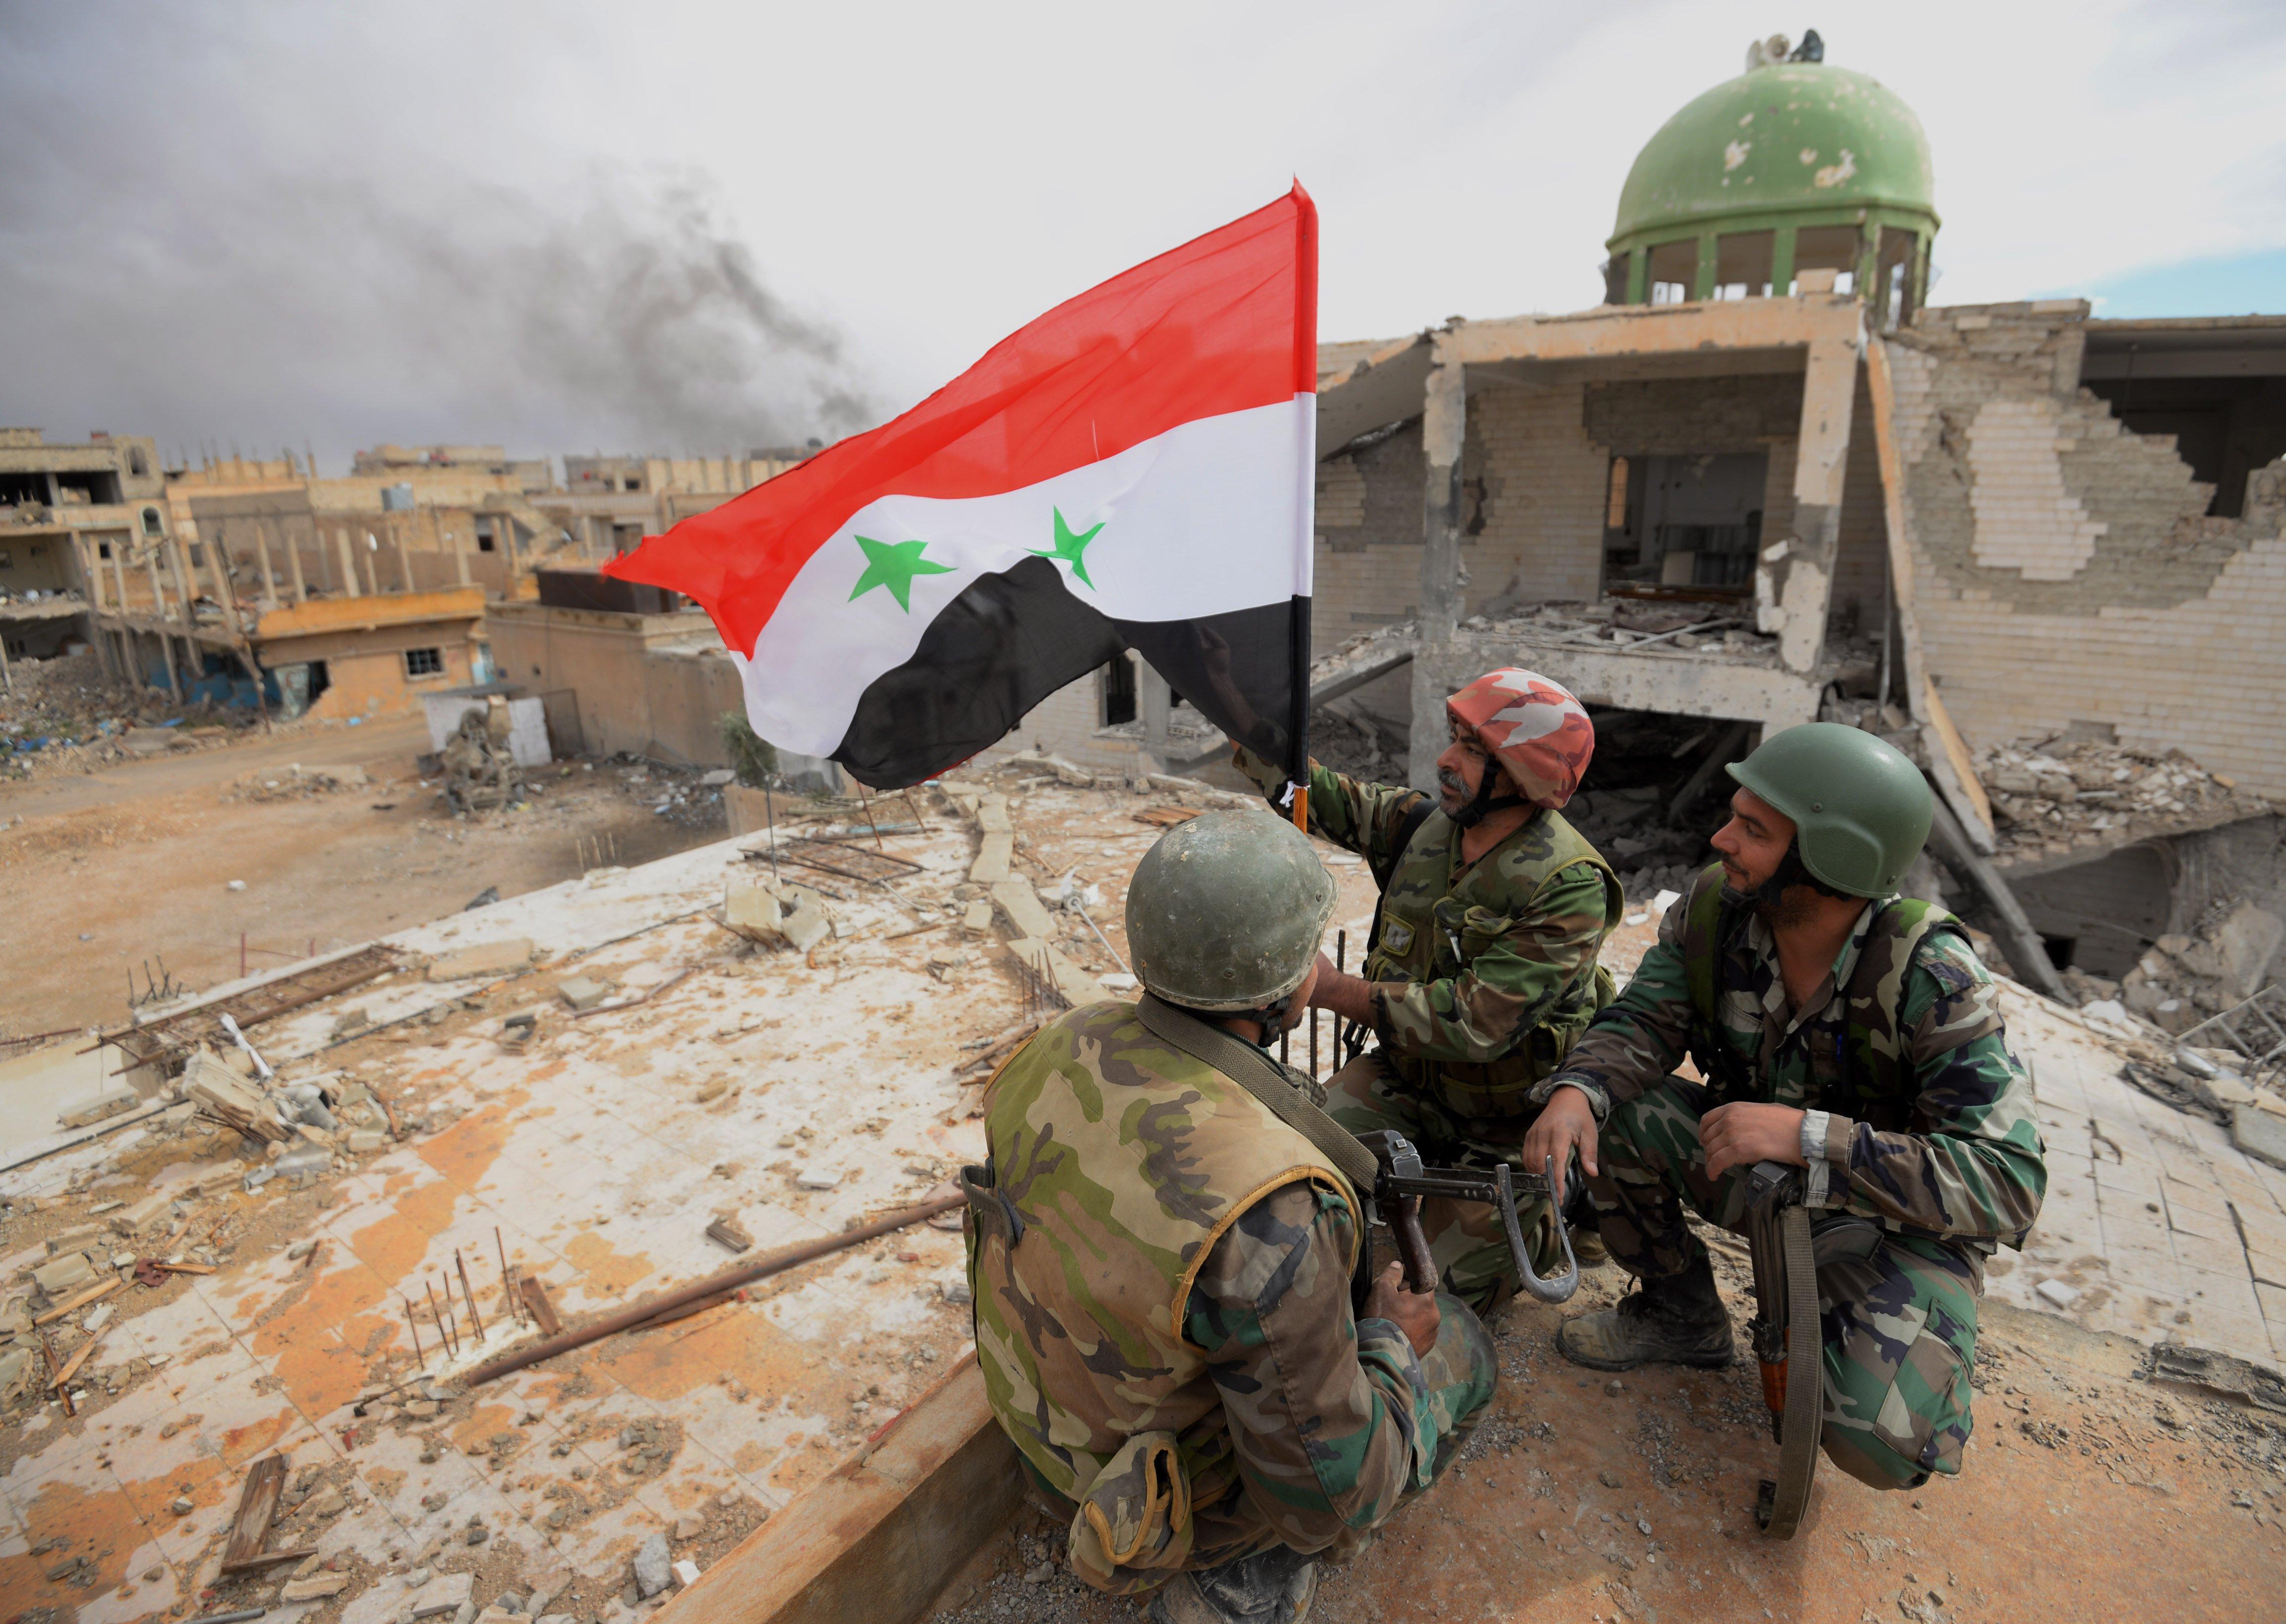 Группа боевиковИГ сдалась сирийской армии вДейр-эз-Зоре